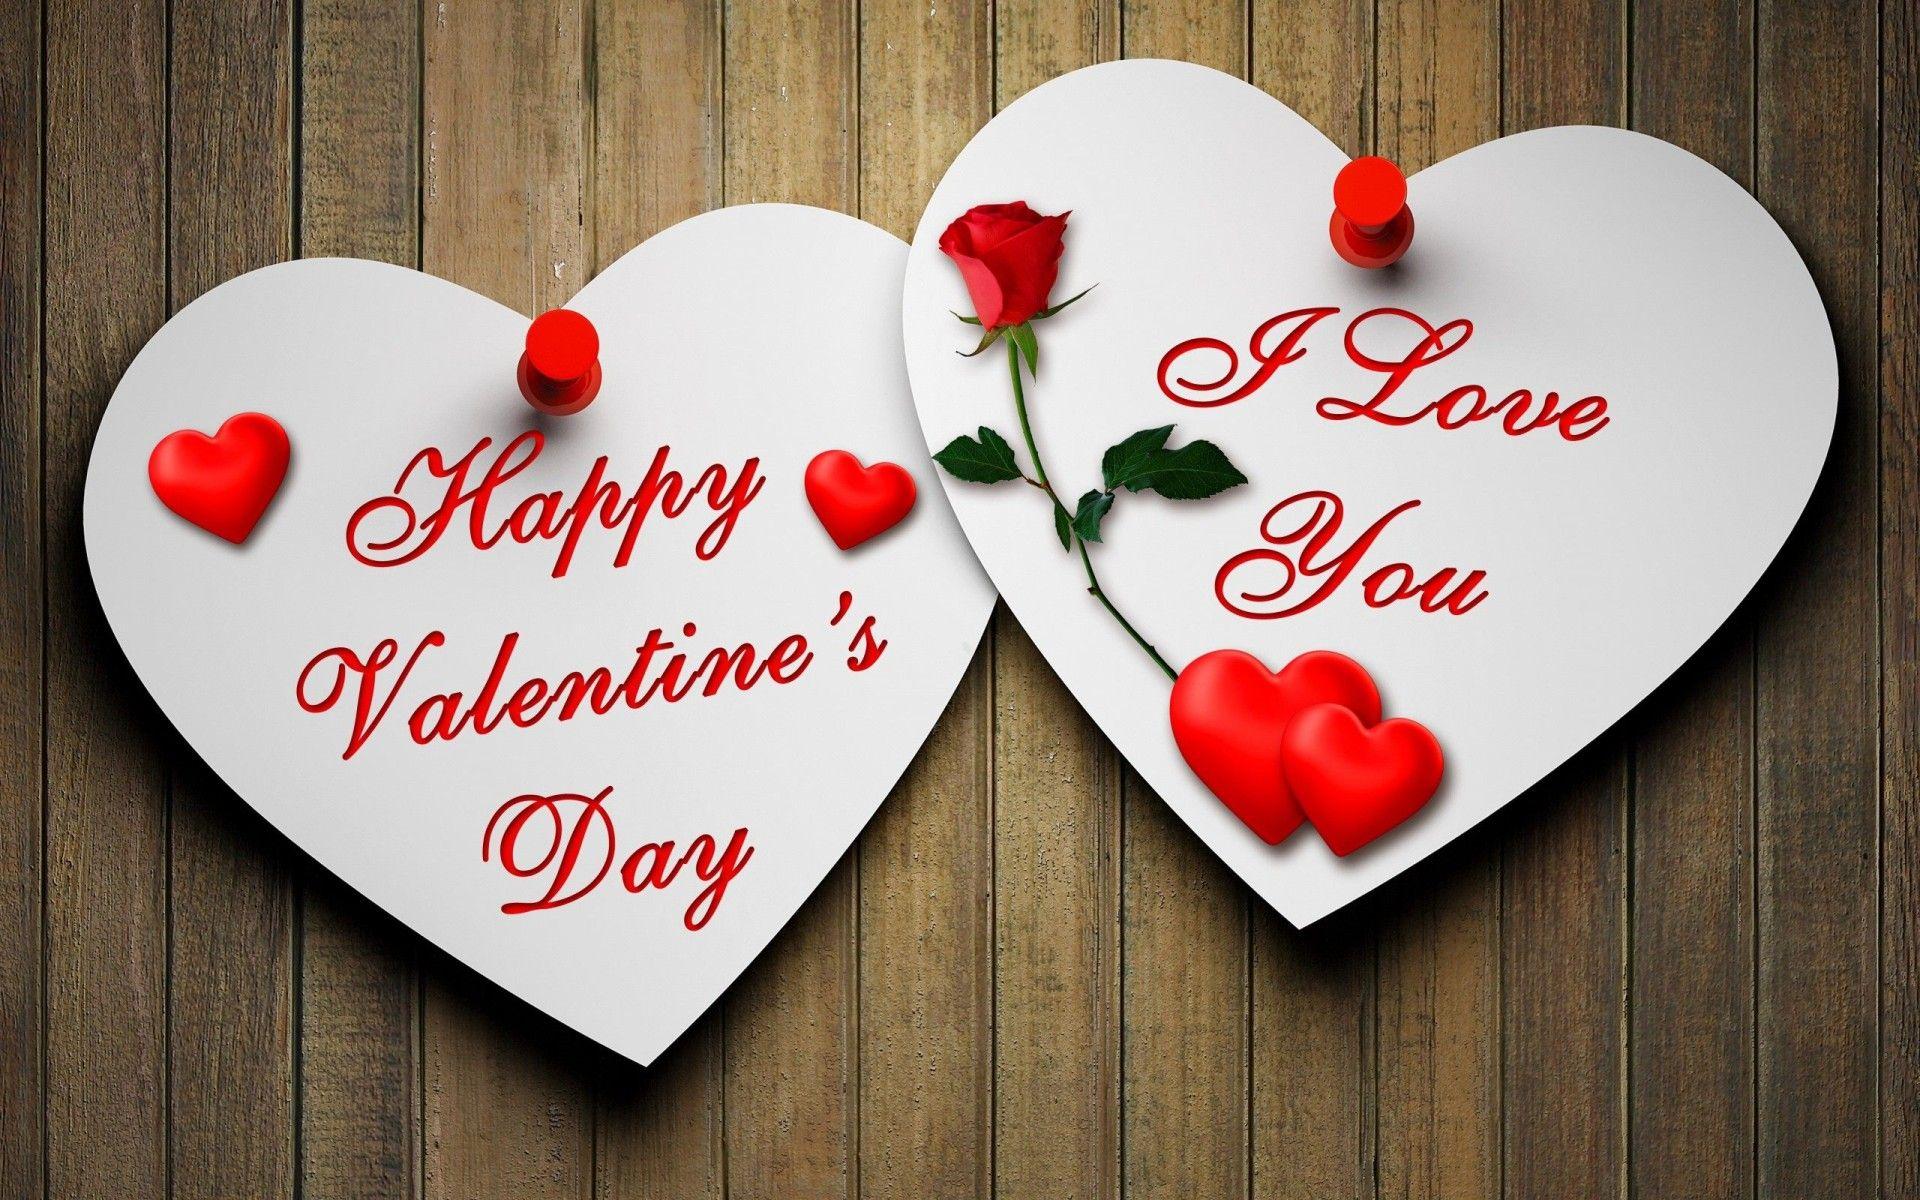 Wallpaper download i love you - Free Download I Love You Wallpapers 1600 900 Love You Desktop Wallpapers 17 Wallpapers